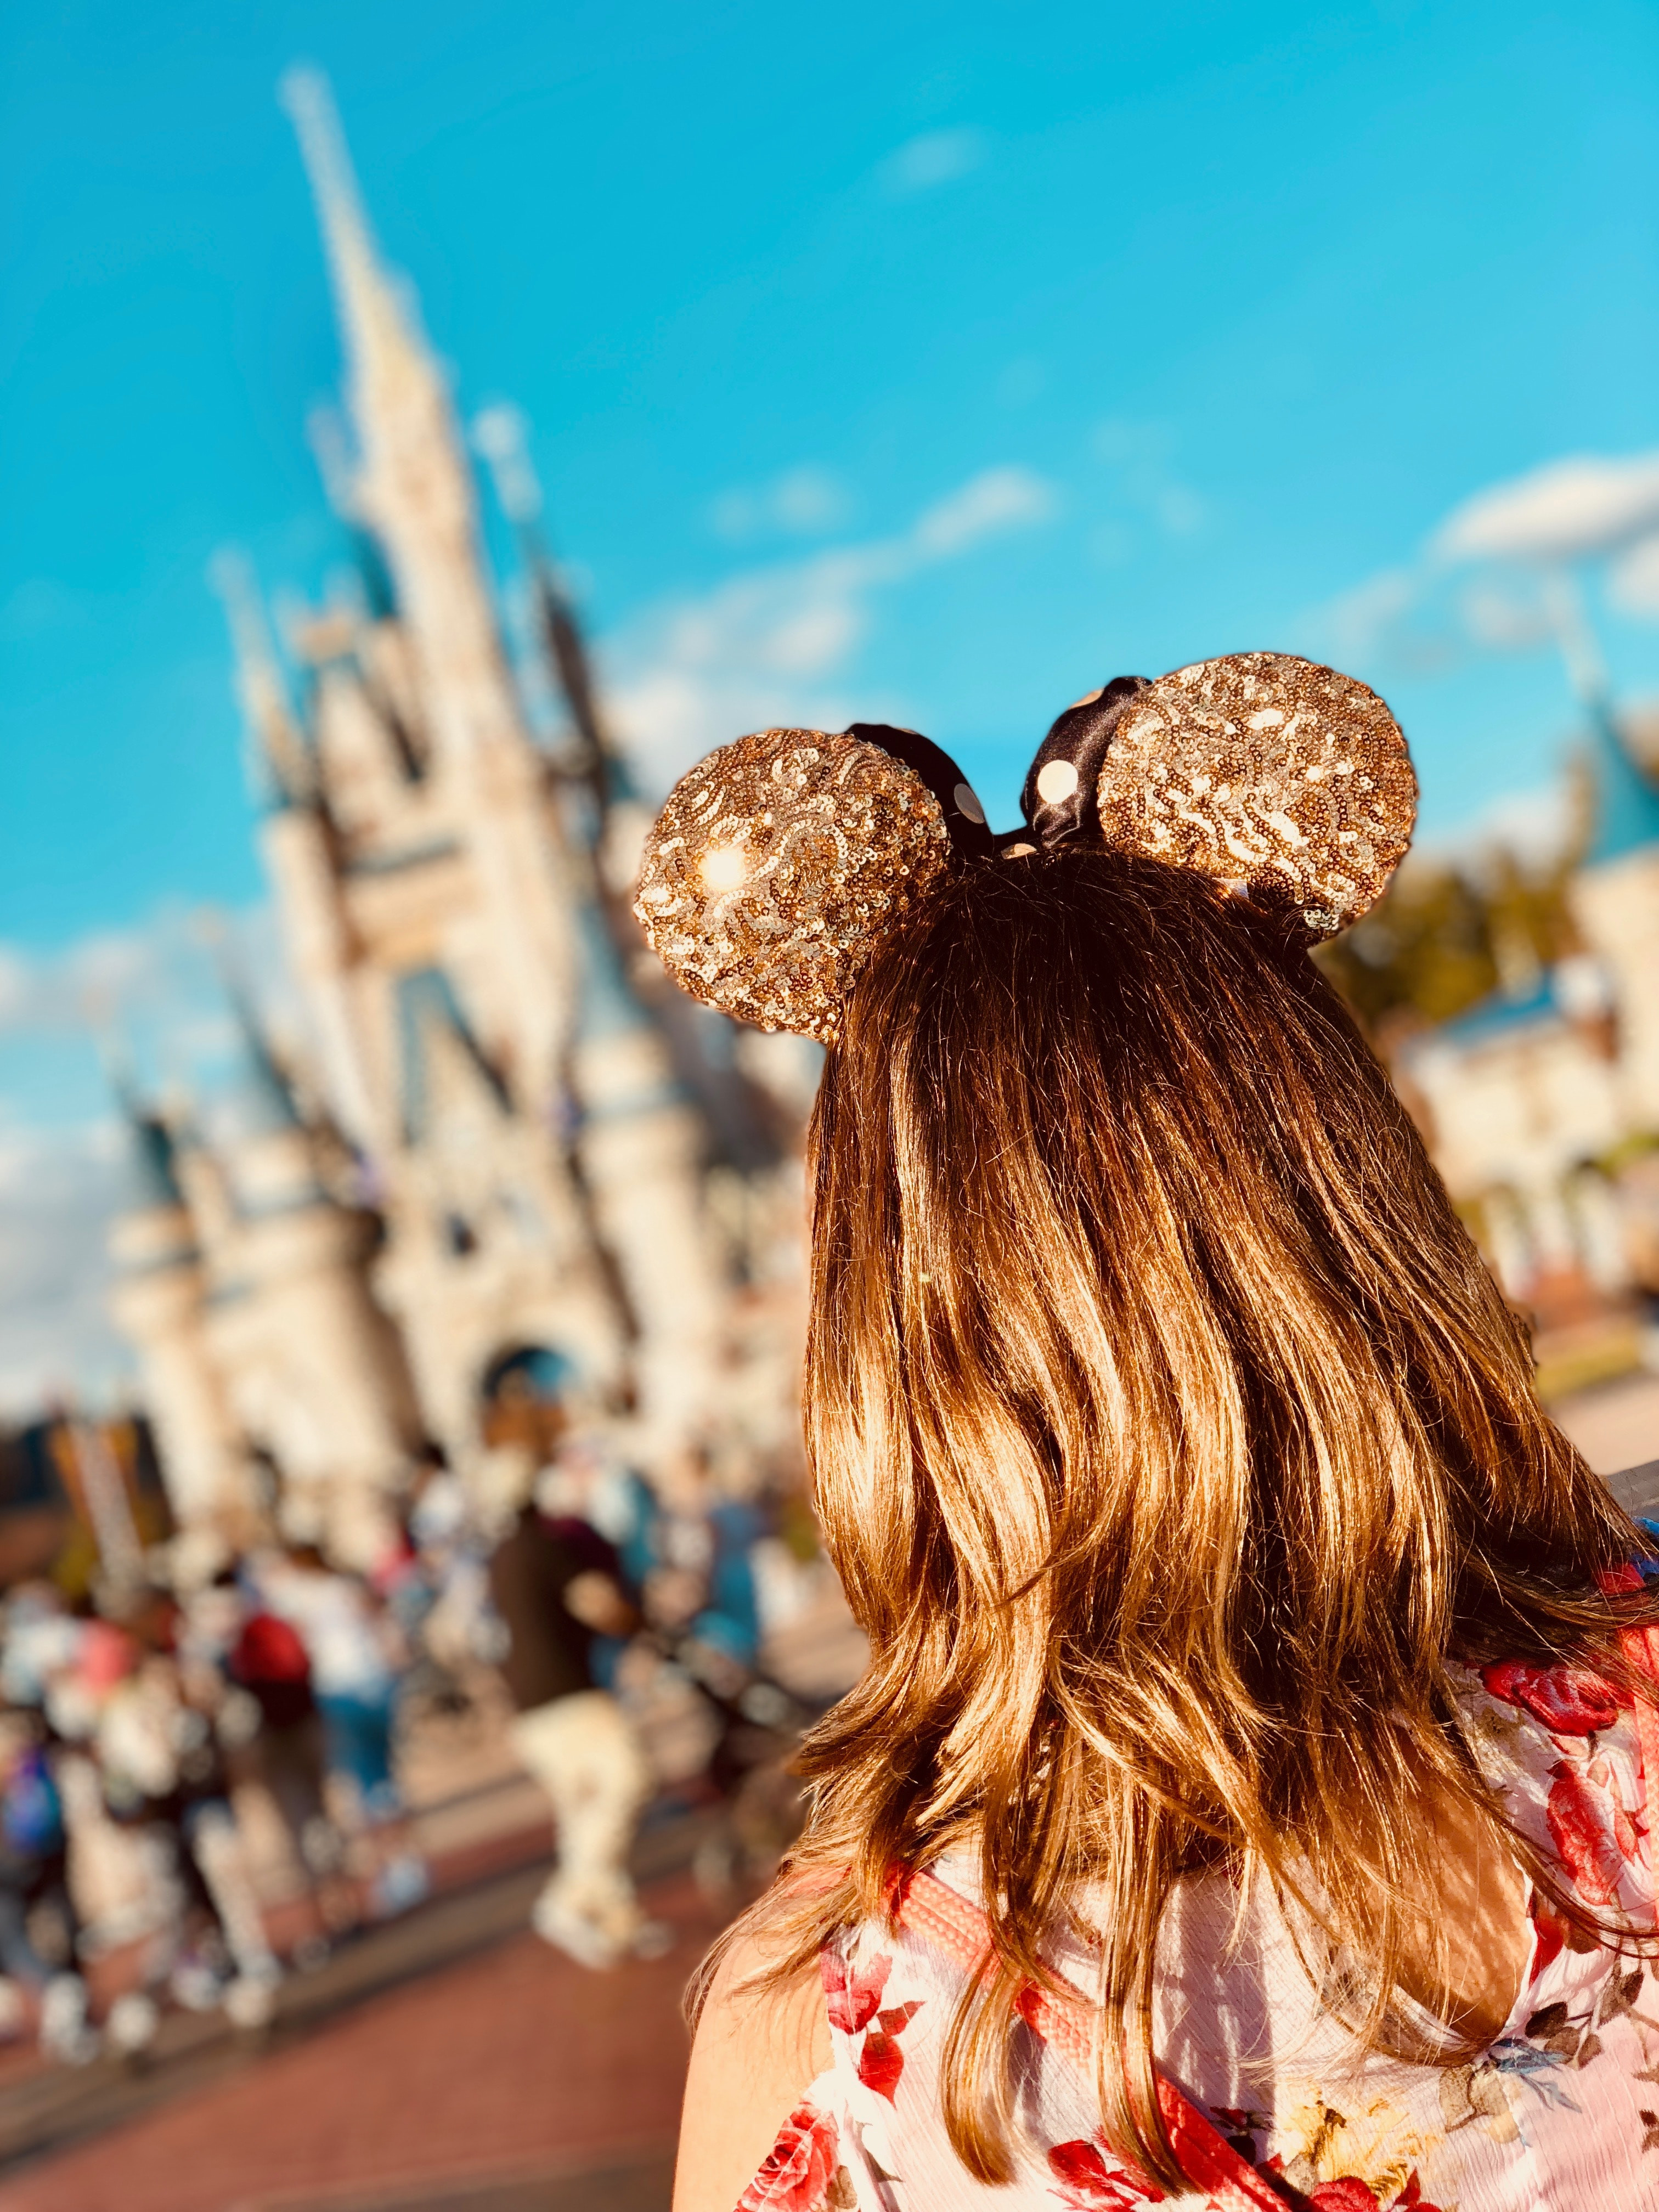 Phone Consultation for Walt Disney World